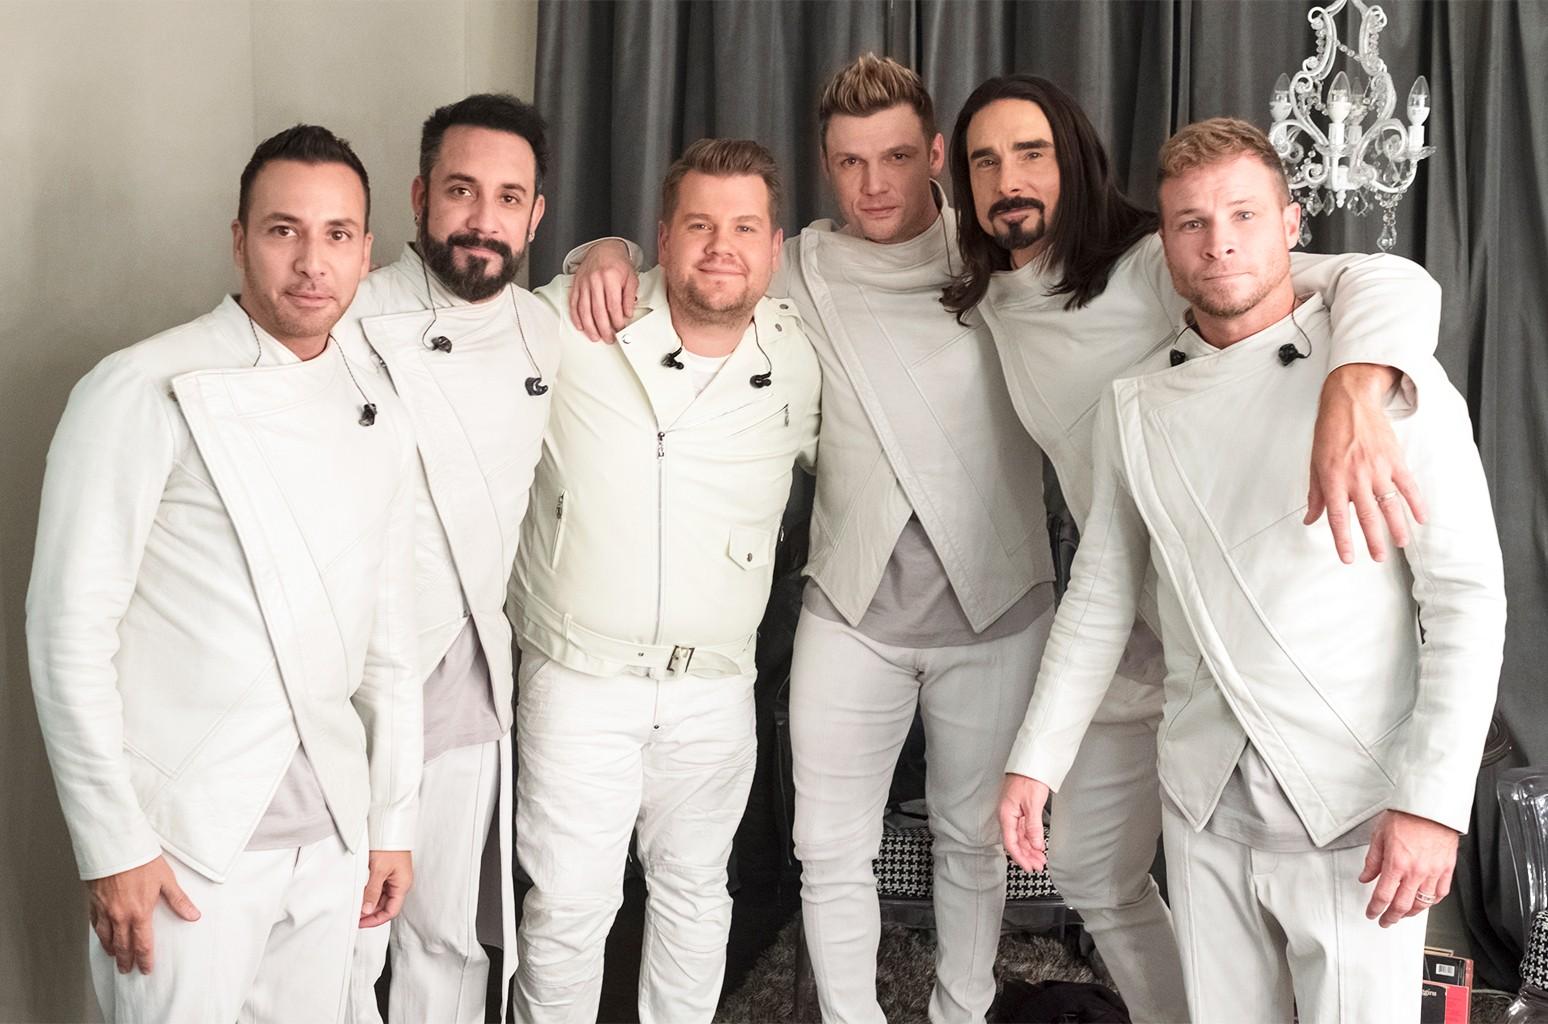 James Corden and The Backstreet Boys